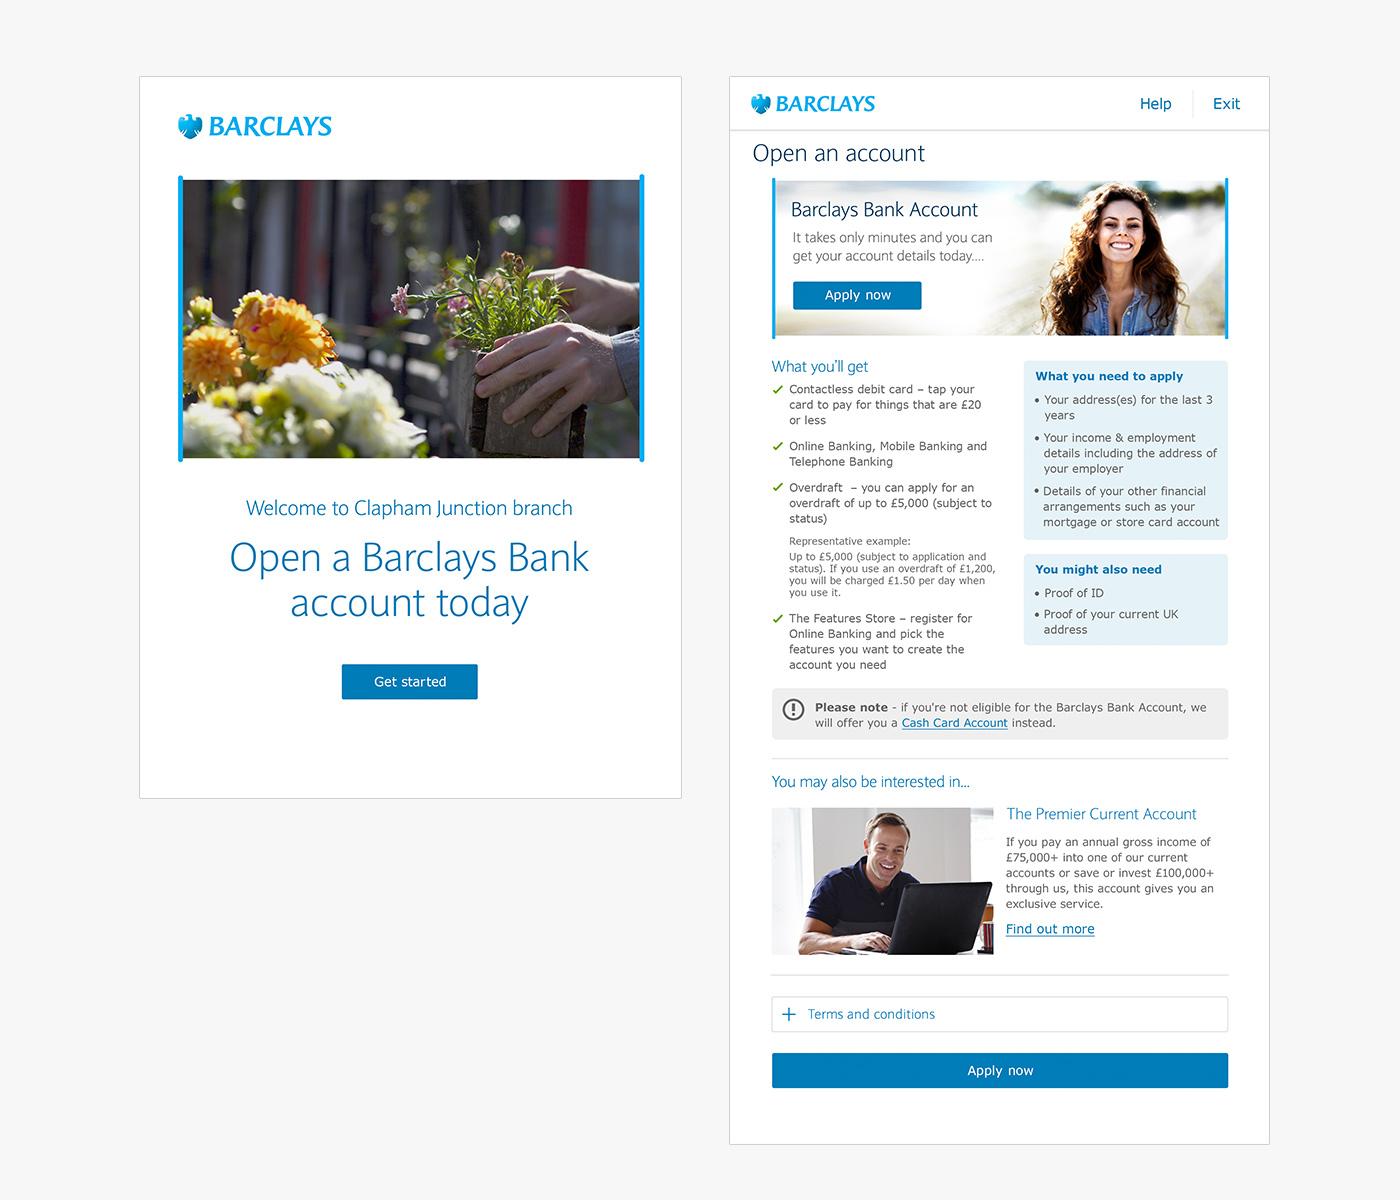 Barclays iPad App in Branch – Ambrosia UX Lab